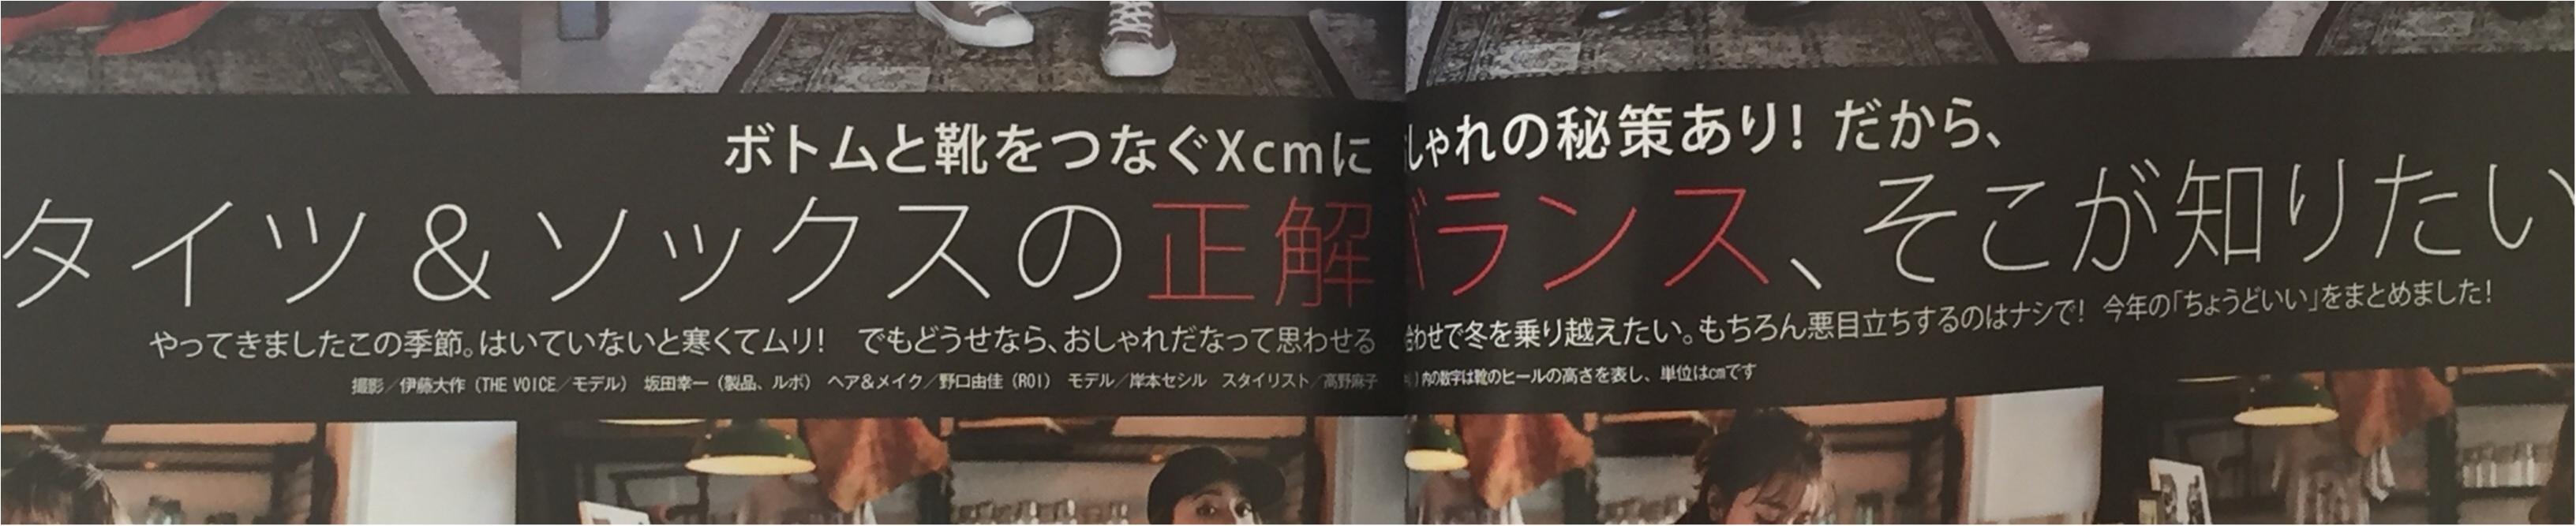 【MORE12月号☆発売中】特別付録はCOACHステーショナリー4点セット✨≪samenyan≫_8